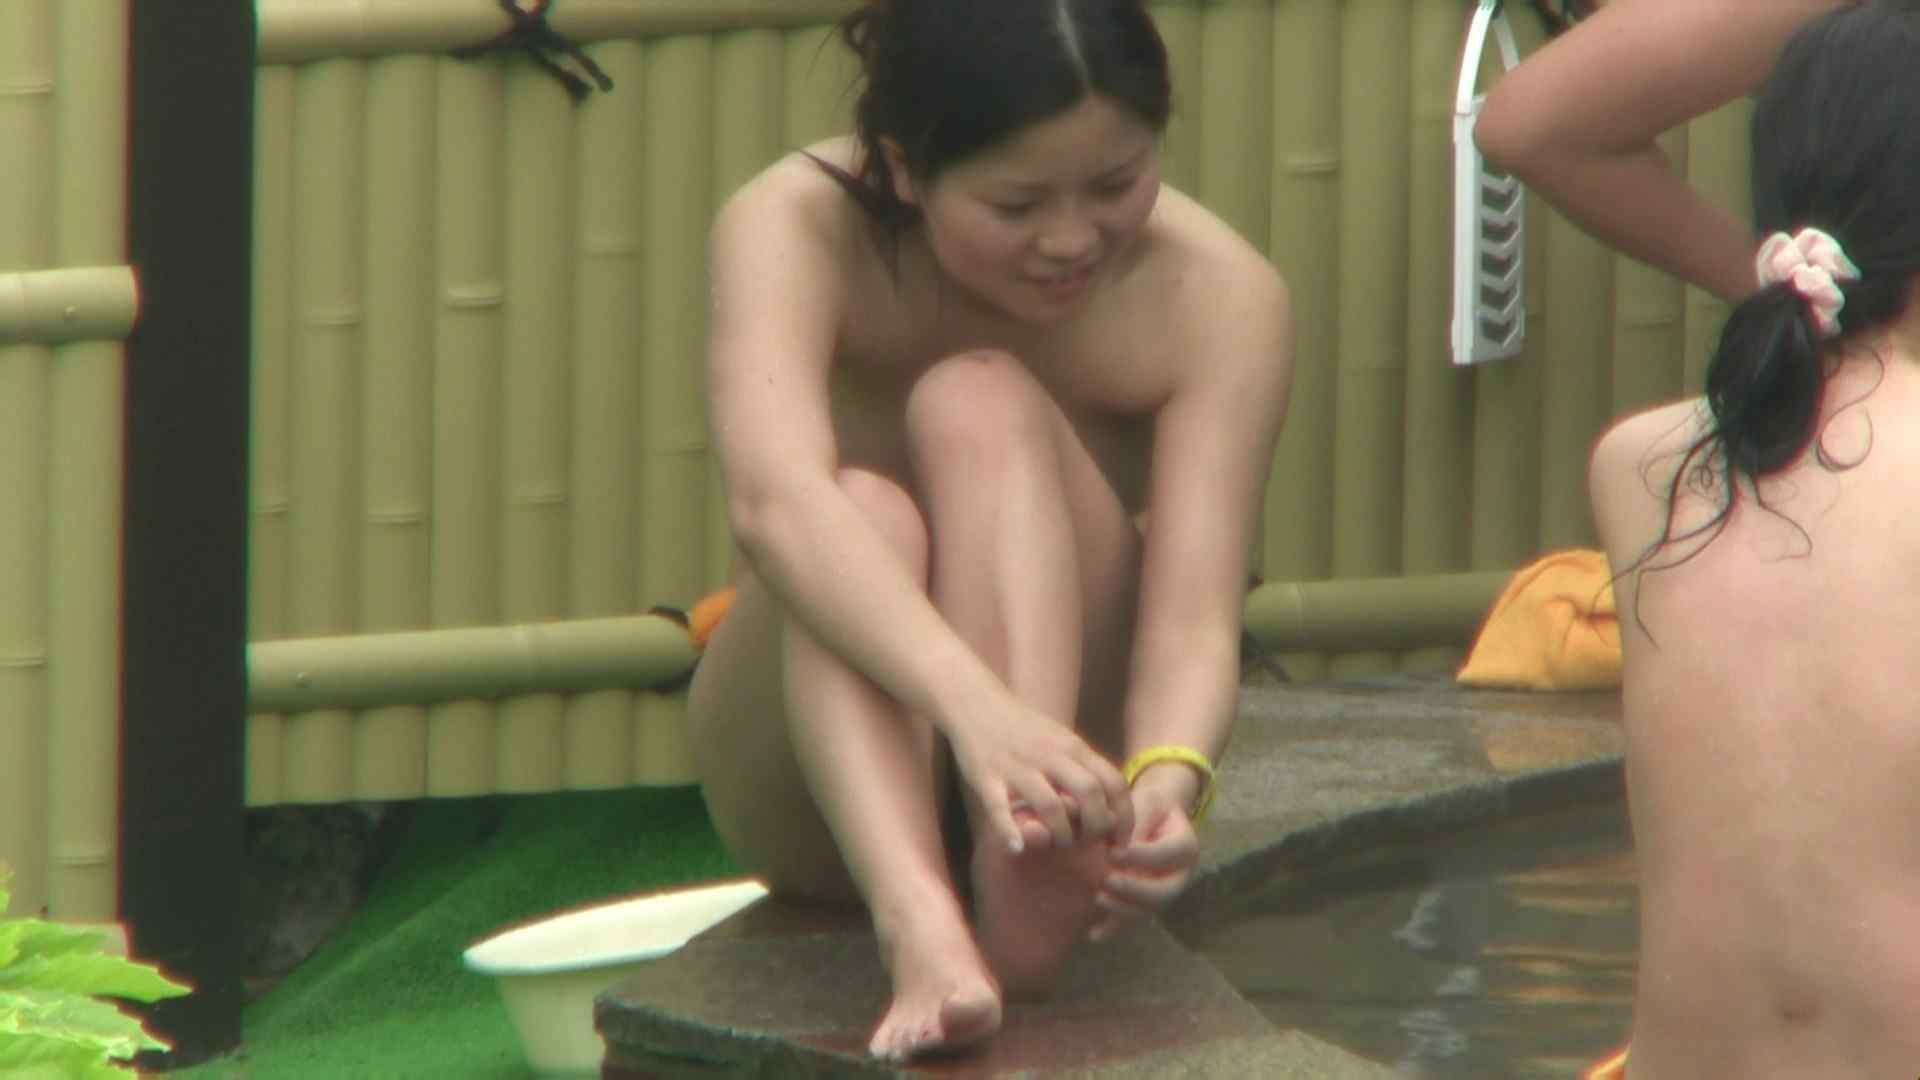 Aquaな露天風呂Vol.74【VIP限定】 OLセックス | 露天  68画像 43